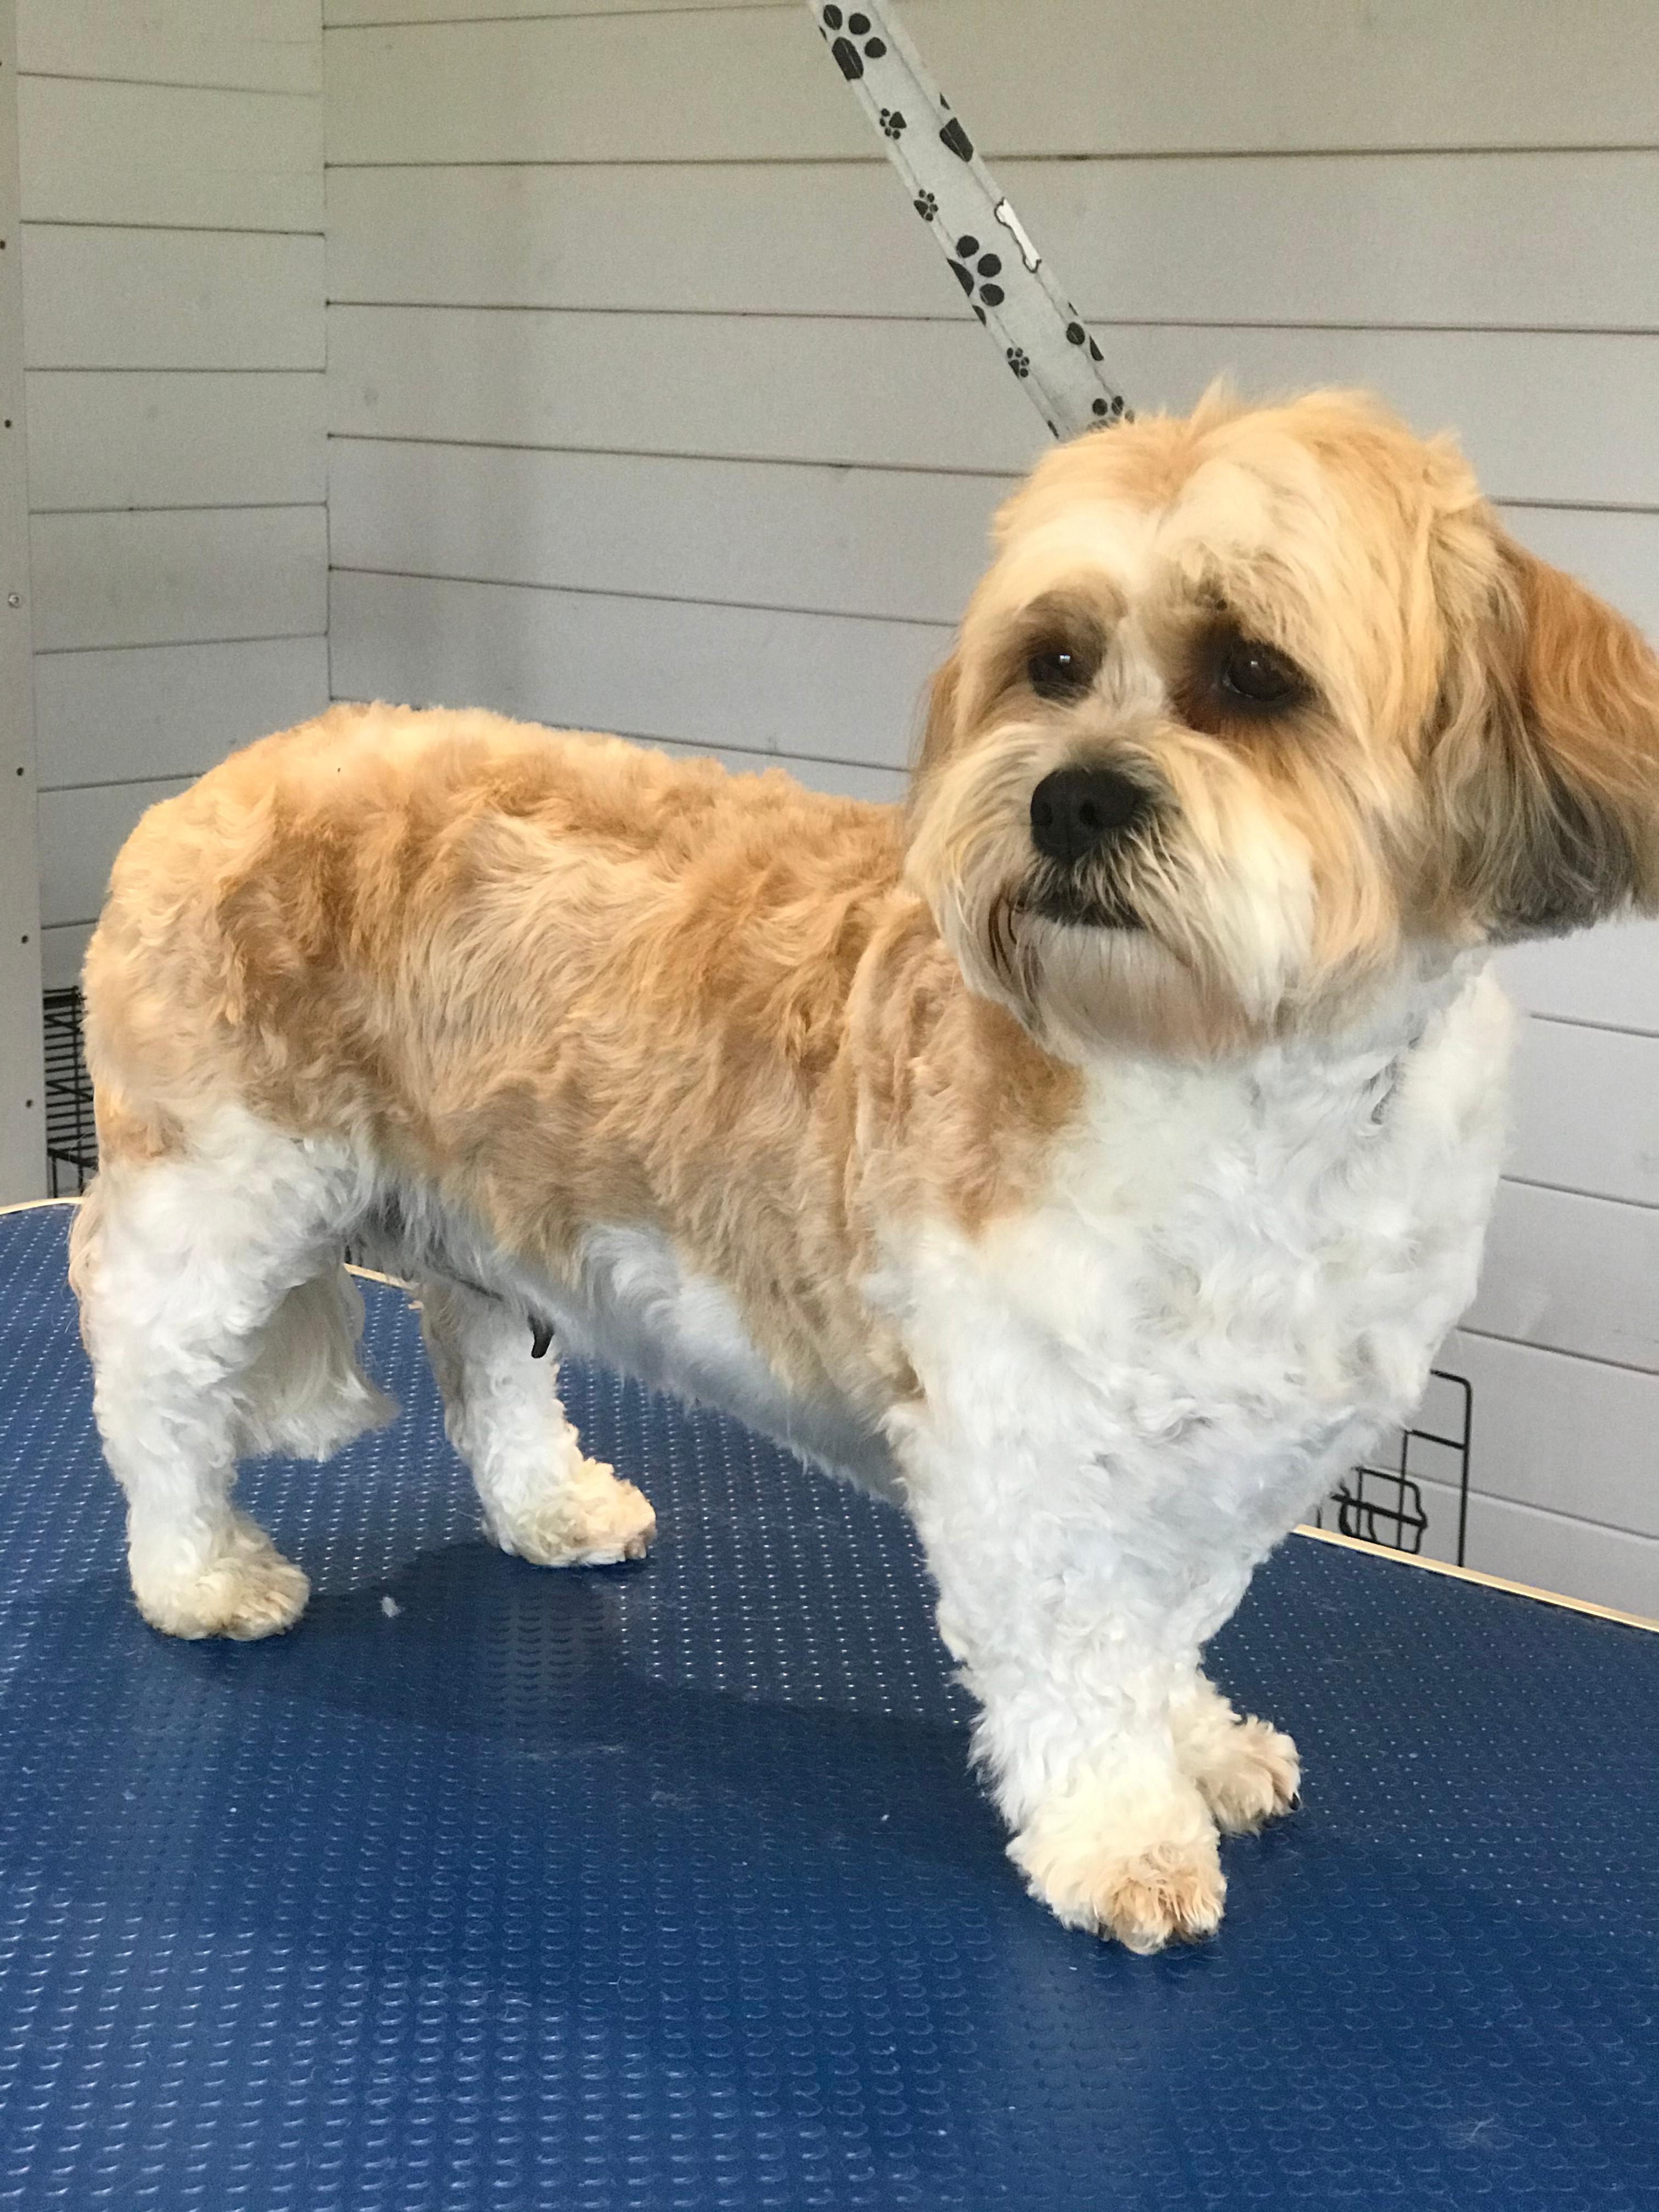 Tatty Tails Dog Grooming